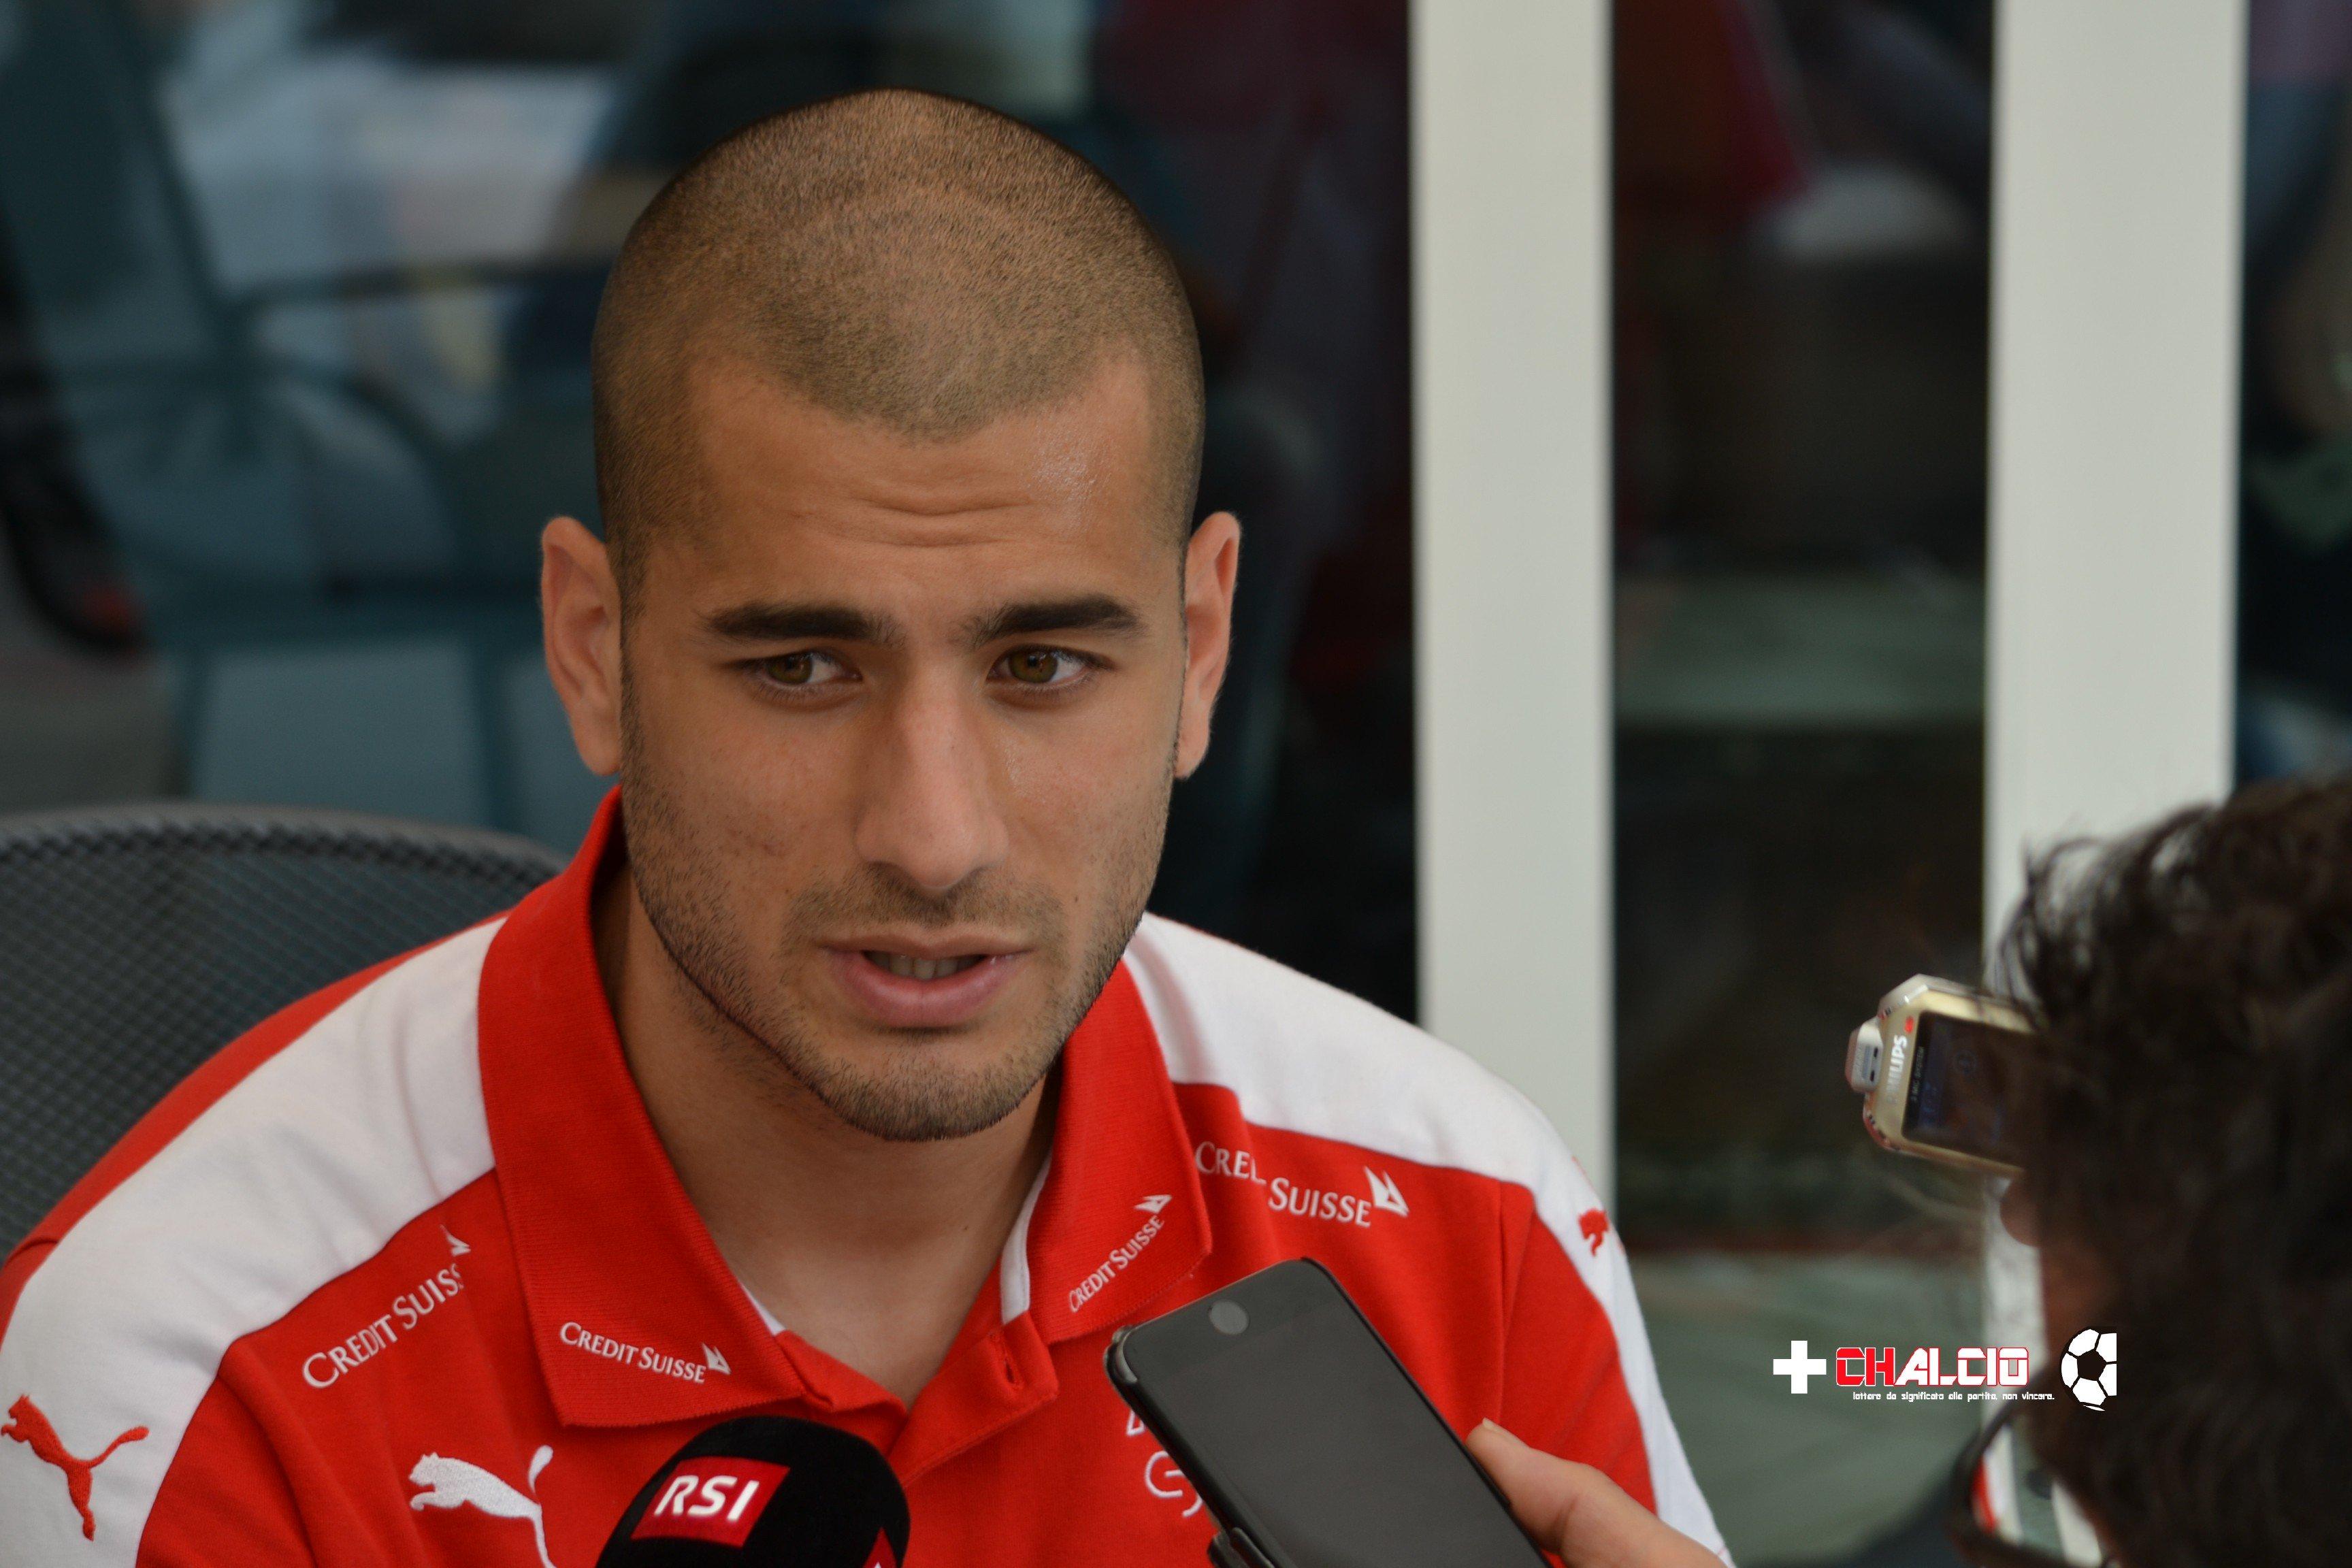 Derdiyok potrebbe passare al Galatasaray